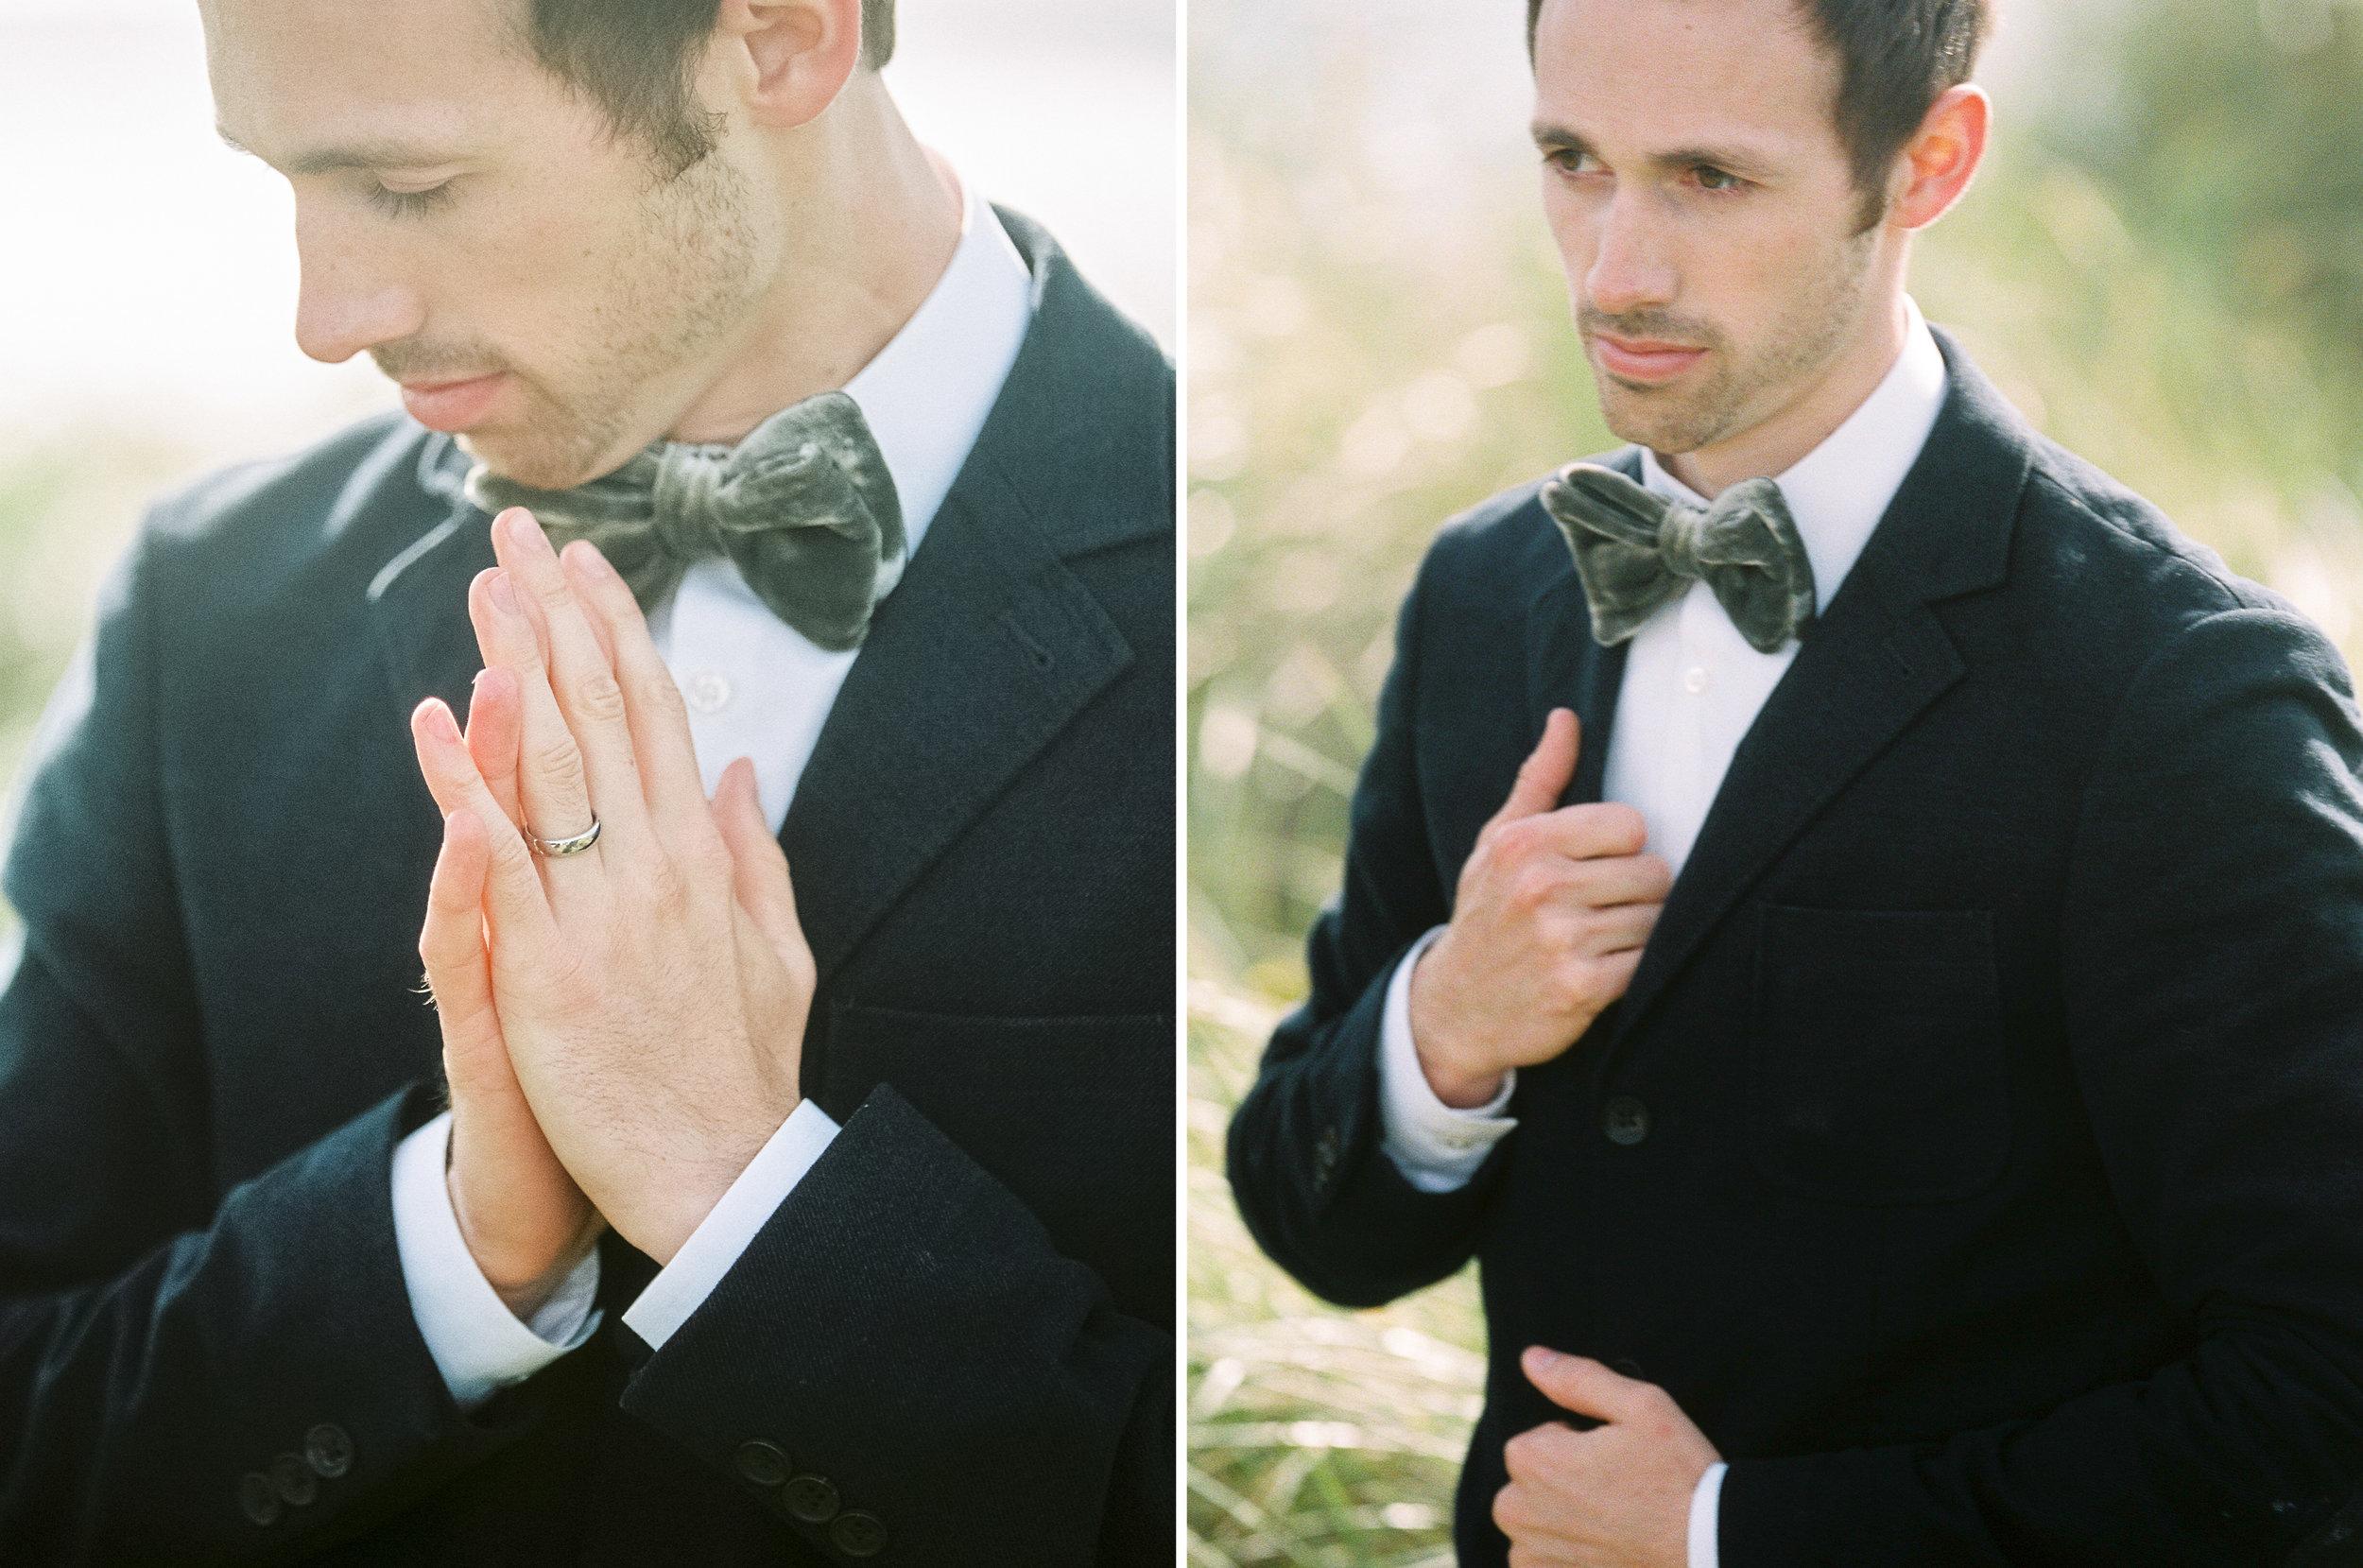 Chen-Sands-Film-Photography-Portraits-Engagement-Elopment-Ireland-Diptych-3.jpg